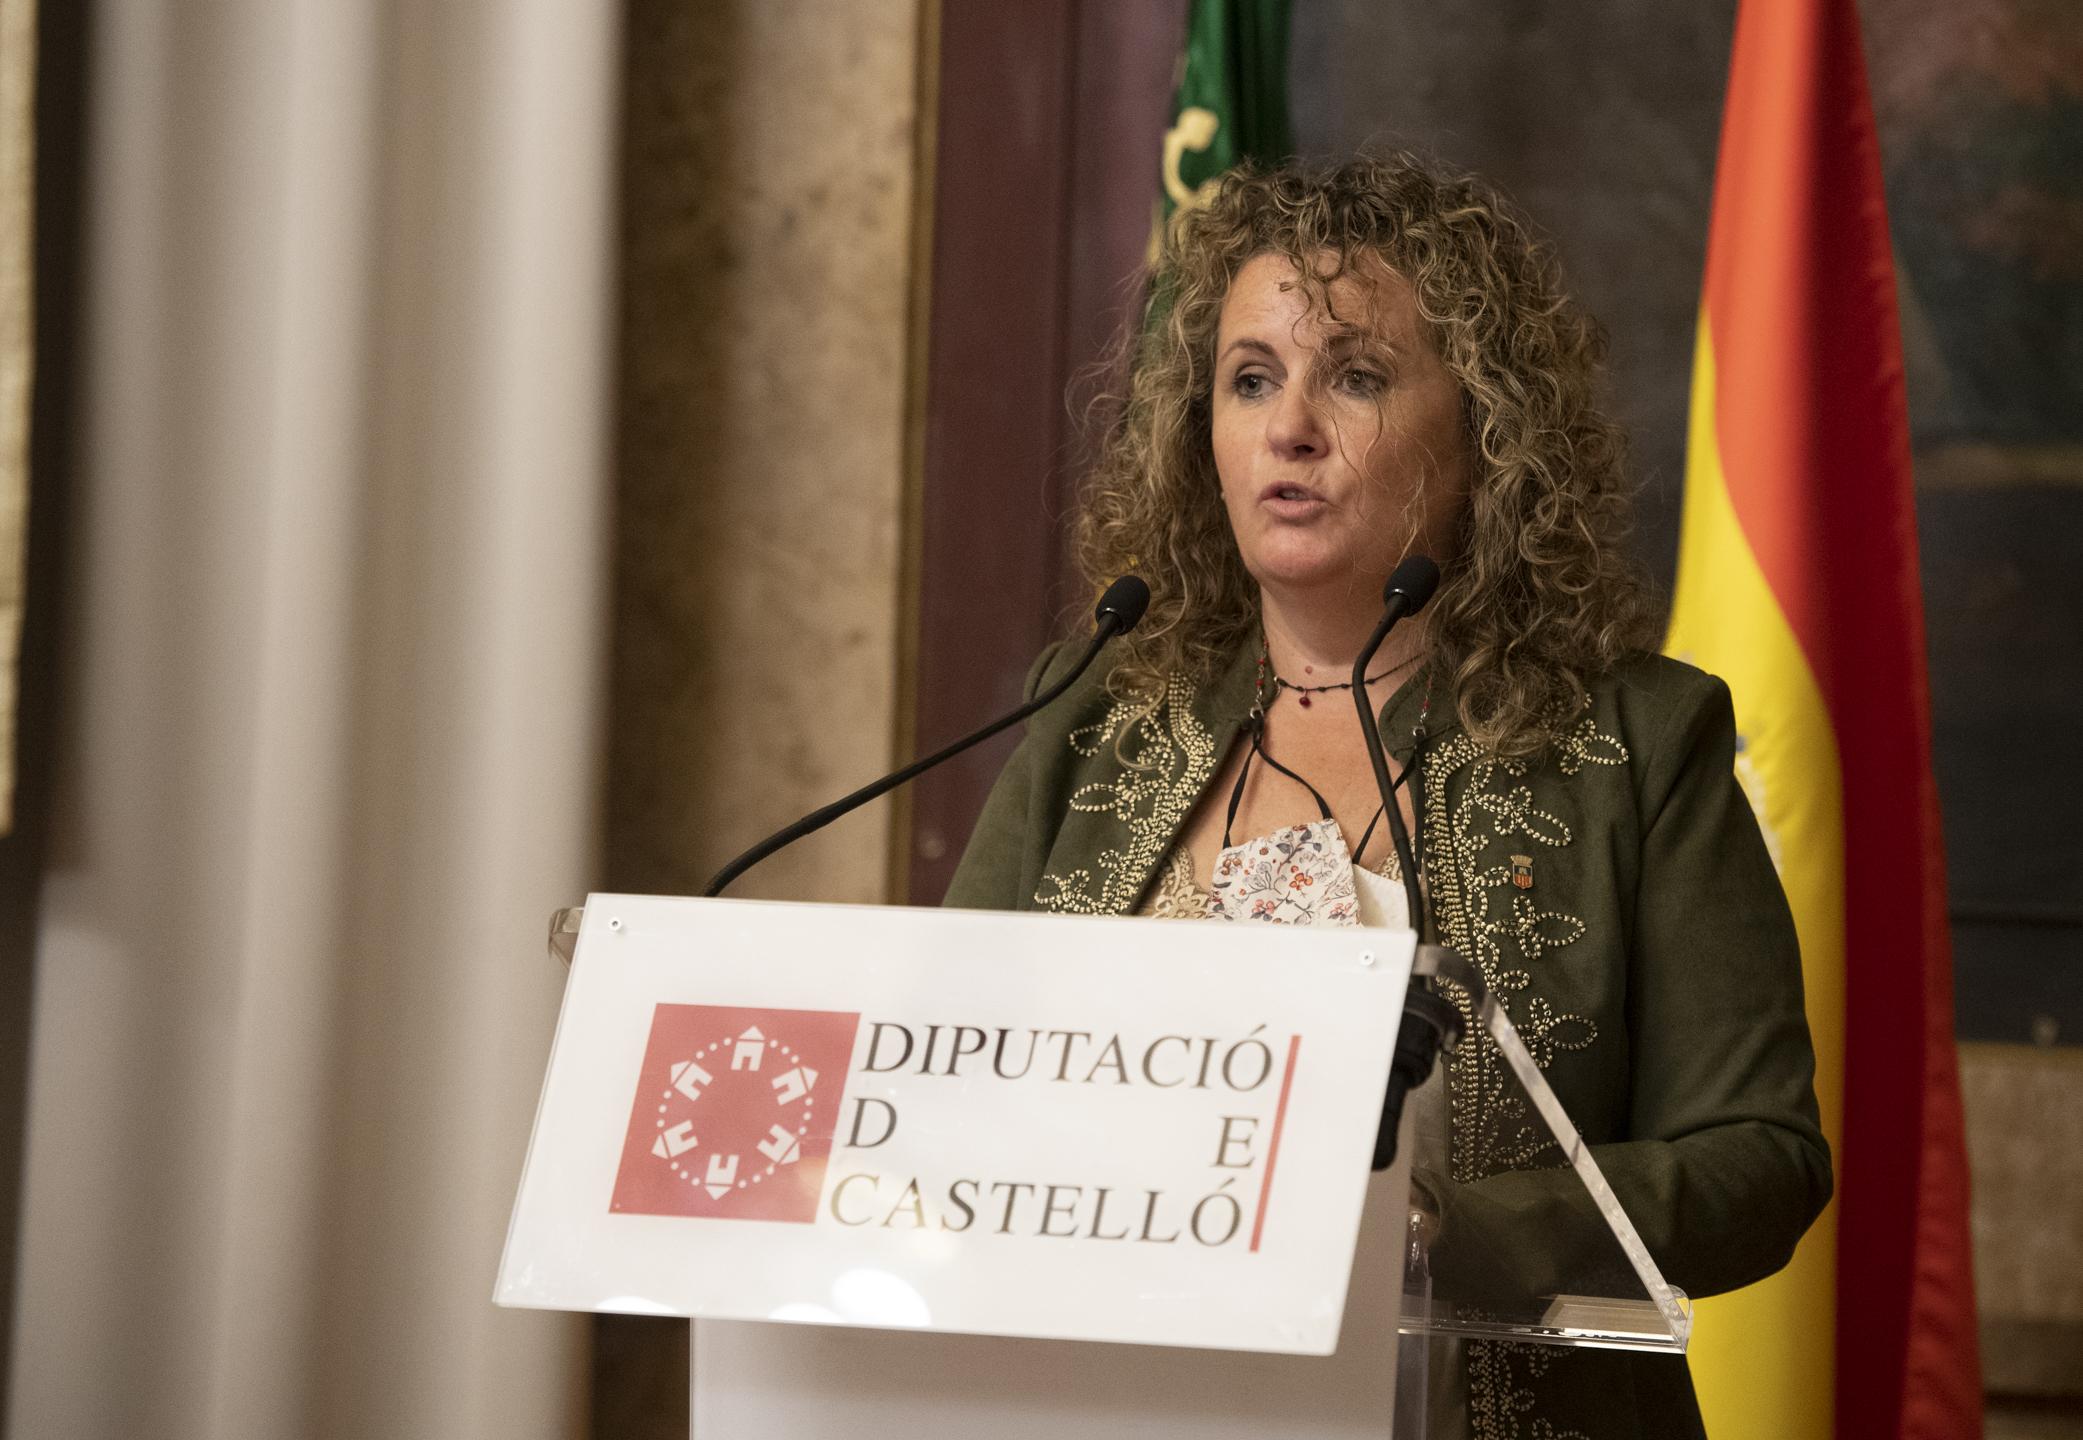 Cristina Fernández (Cs) lamenta «la subida imparable del paro en la provincia de Castellón»